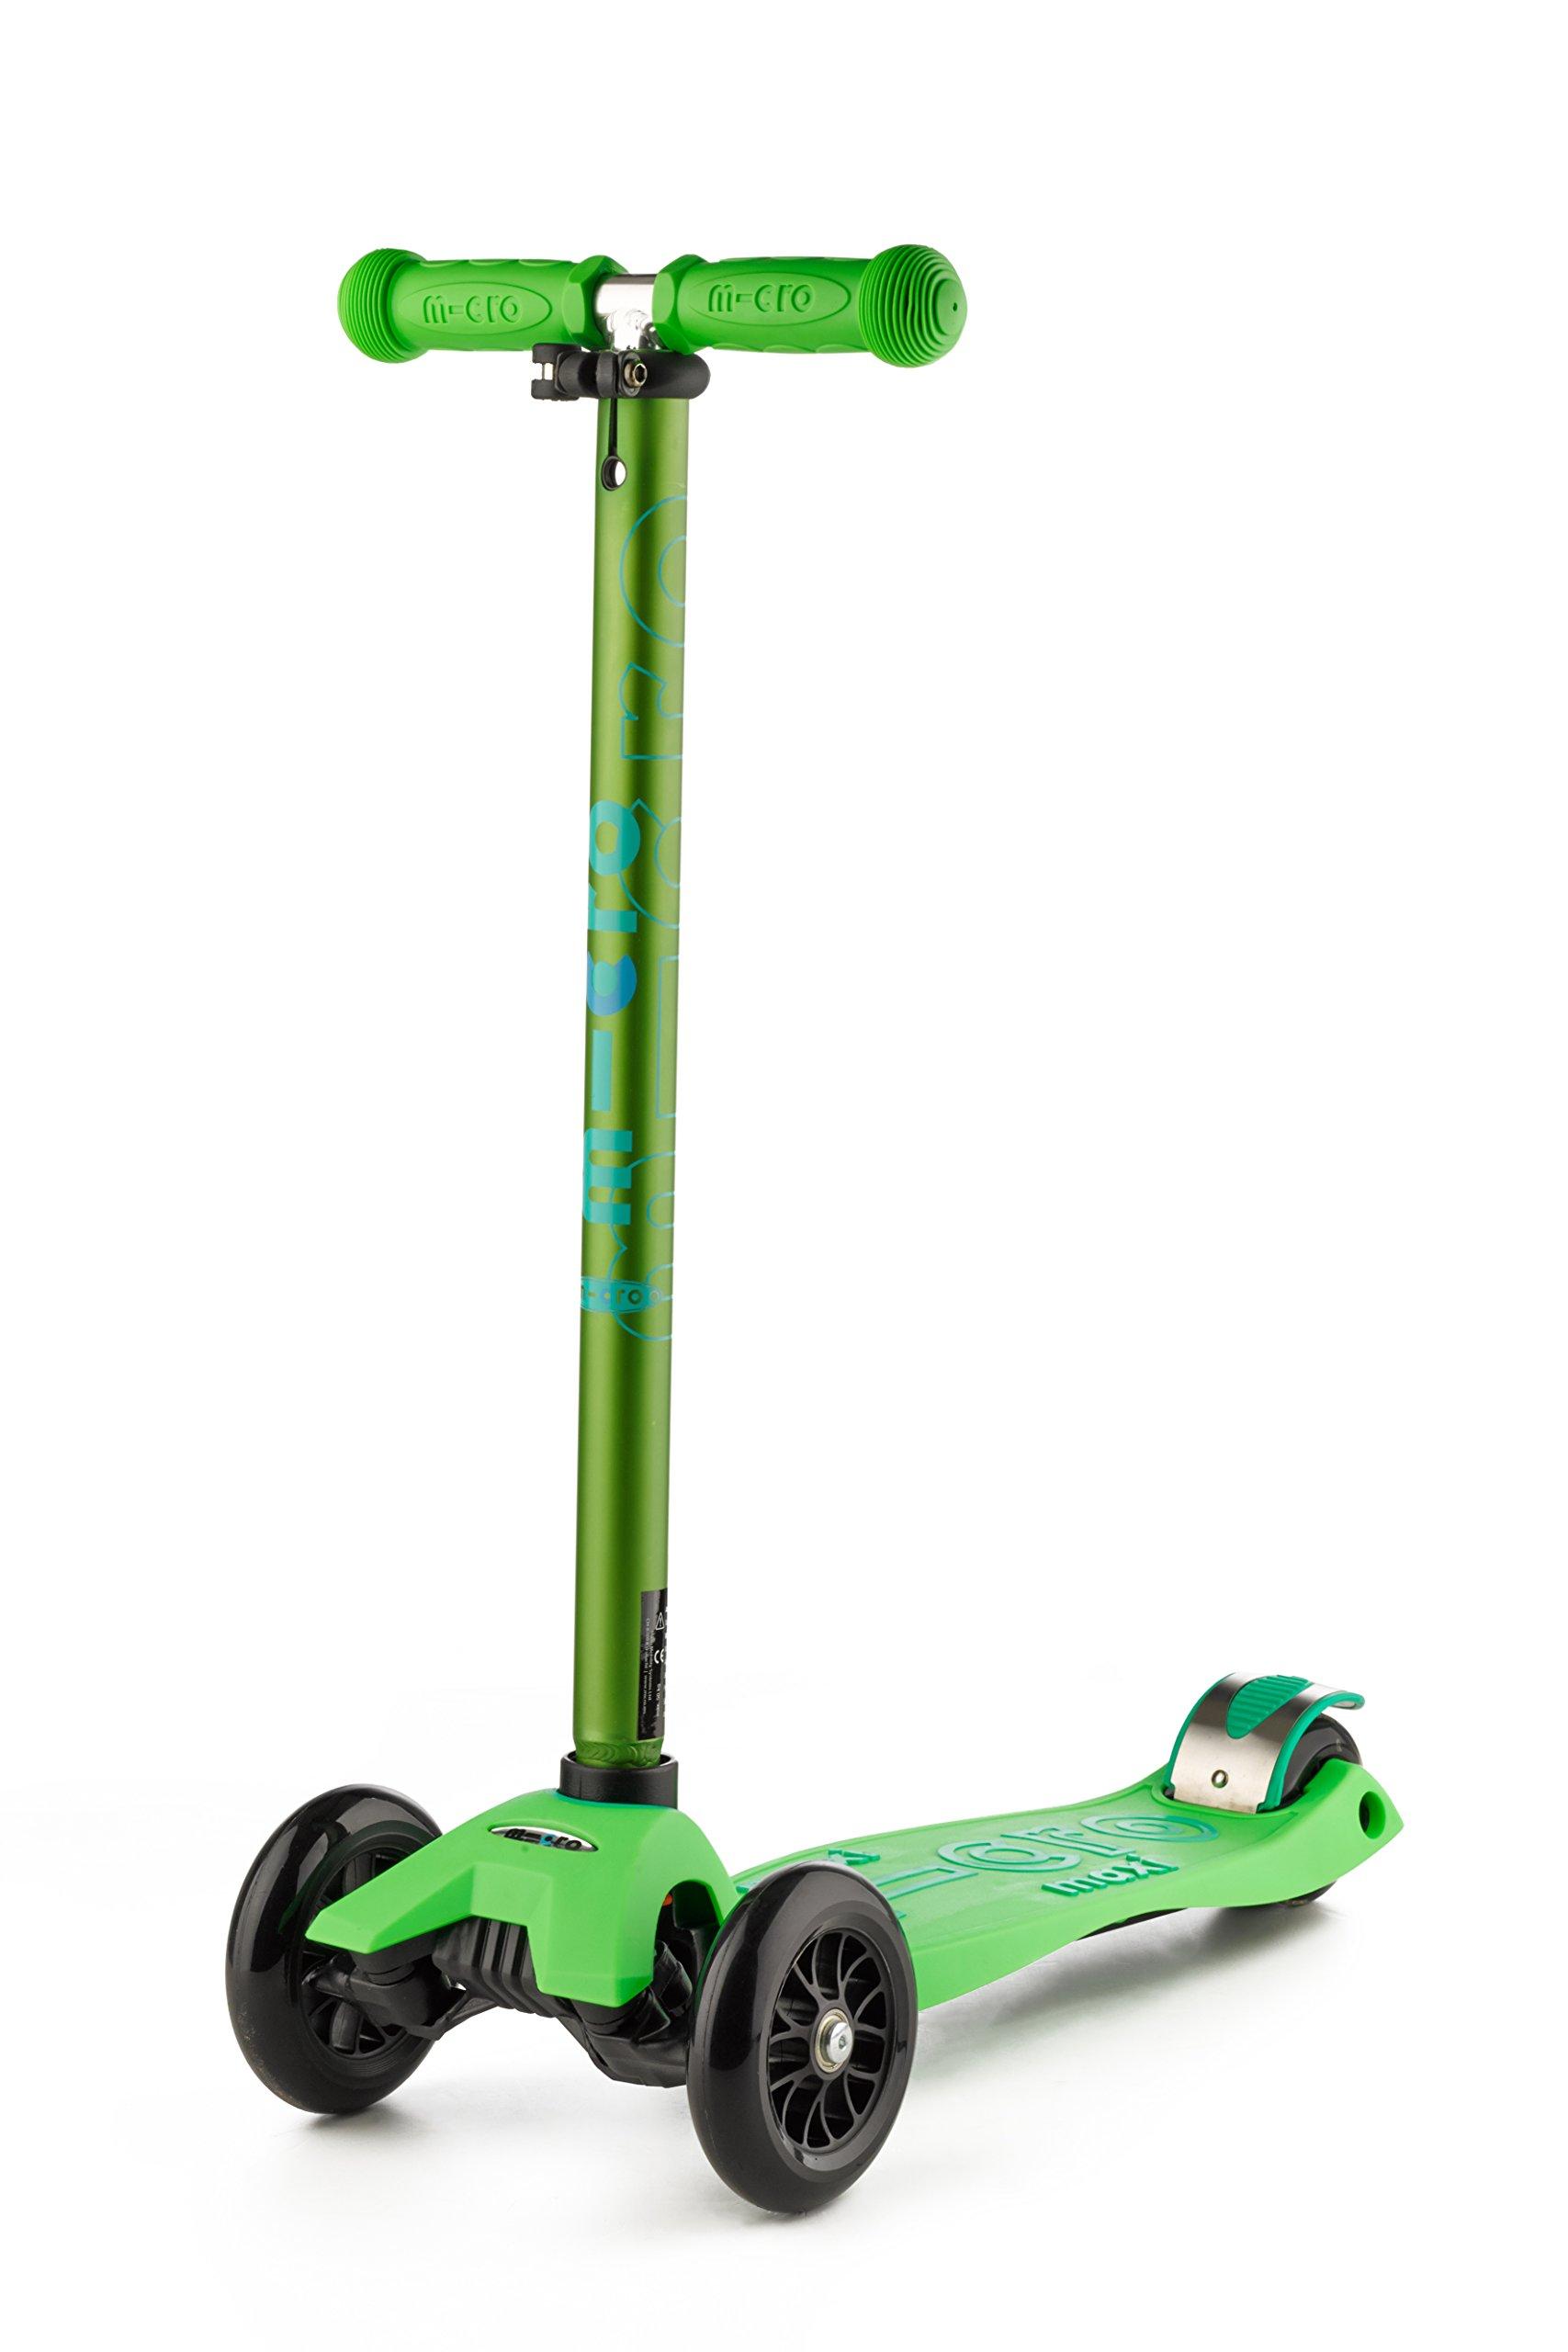 Micro Maxi Deluxe Kick Scooters (Green) by Micro Kickboard (Image #7)